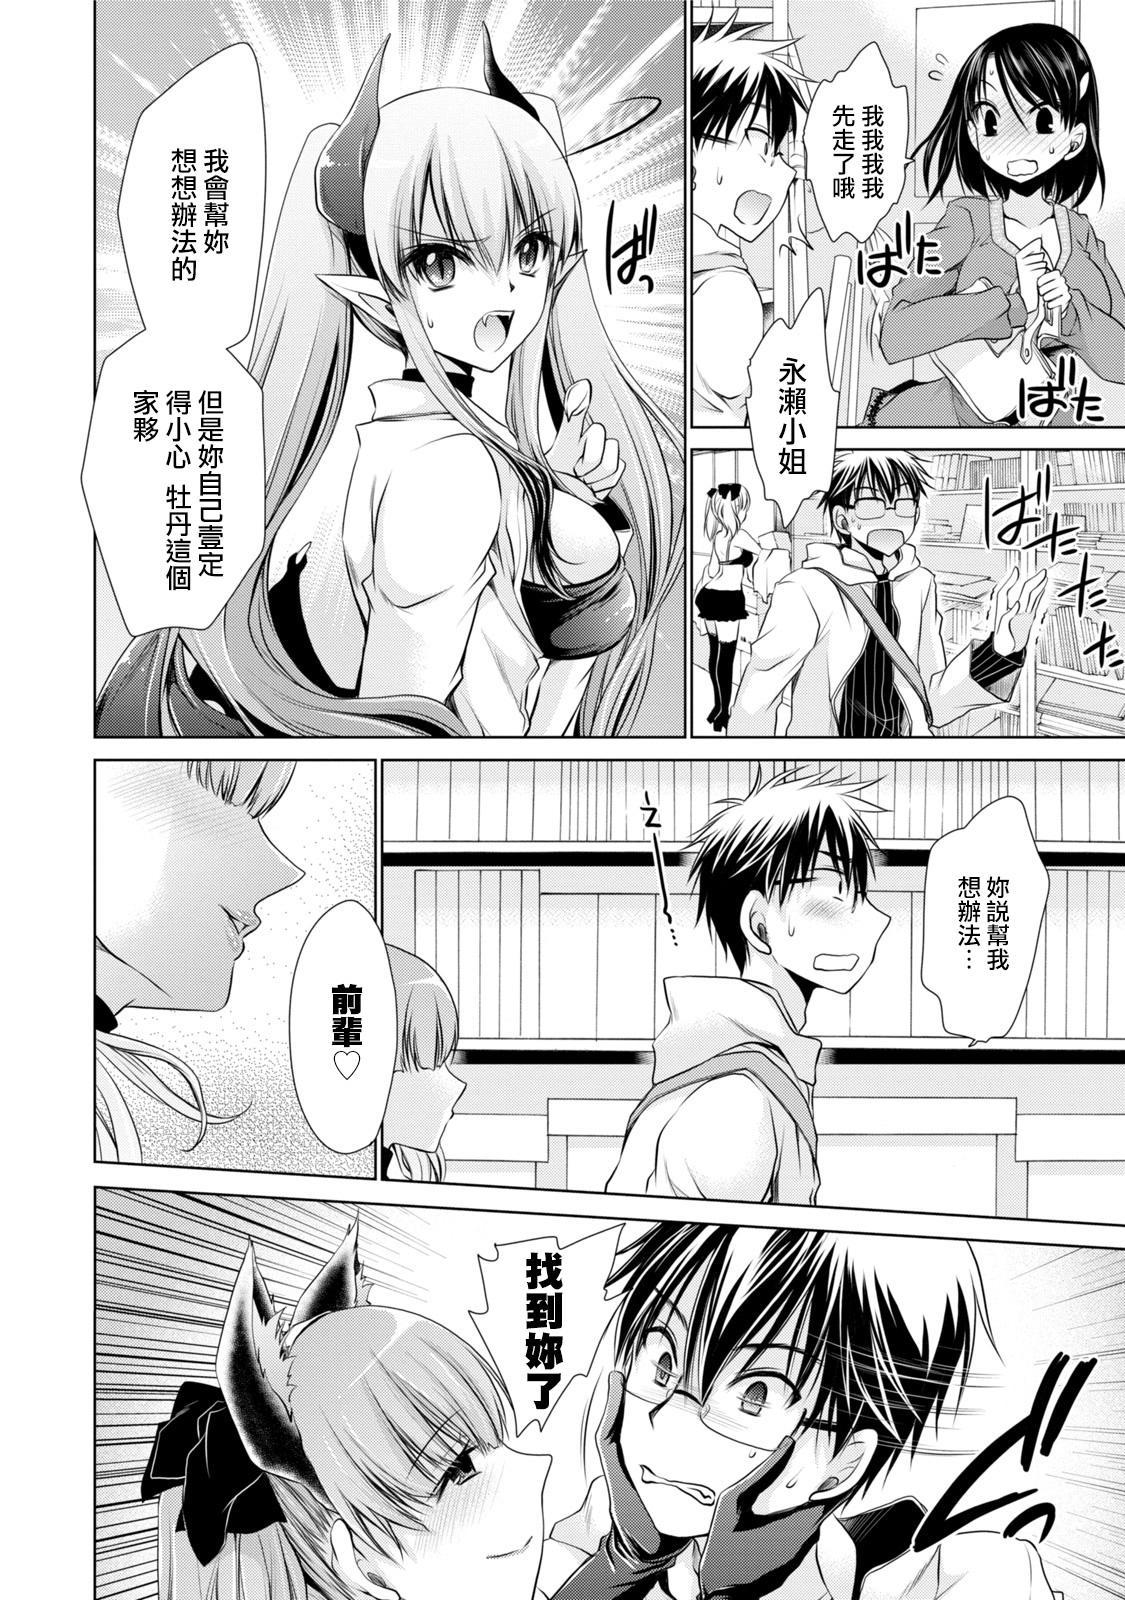 [Shinonome Ryu] Ore to Kanojo to Owaru Sekai - World's end LoveStory ch.1-9 [Chinese] [爱弹幕汉化组] [Digital] 77